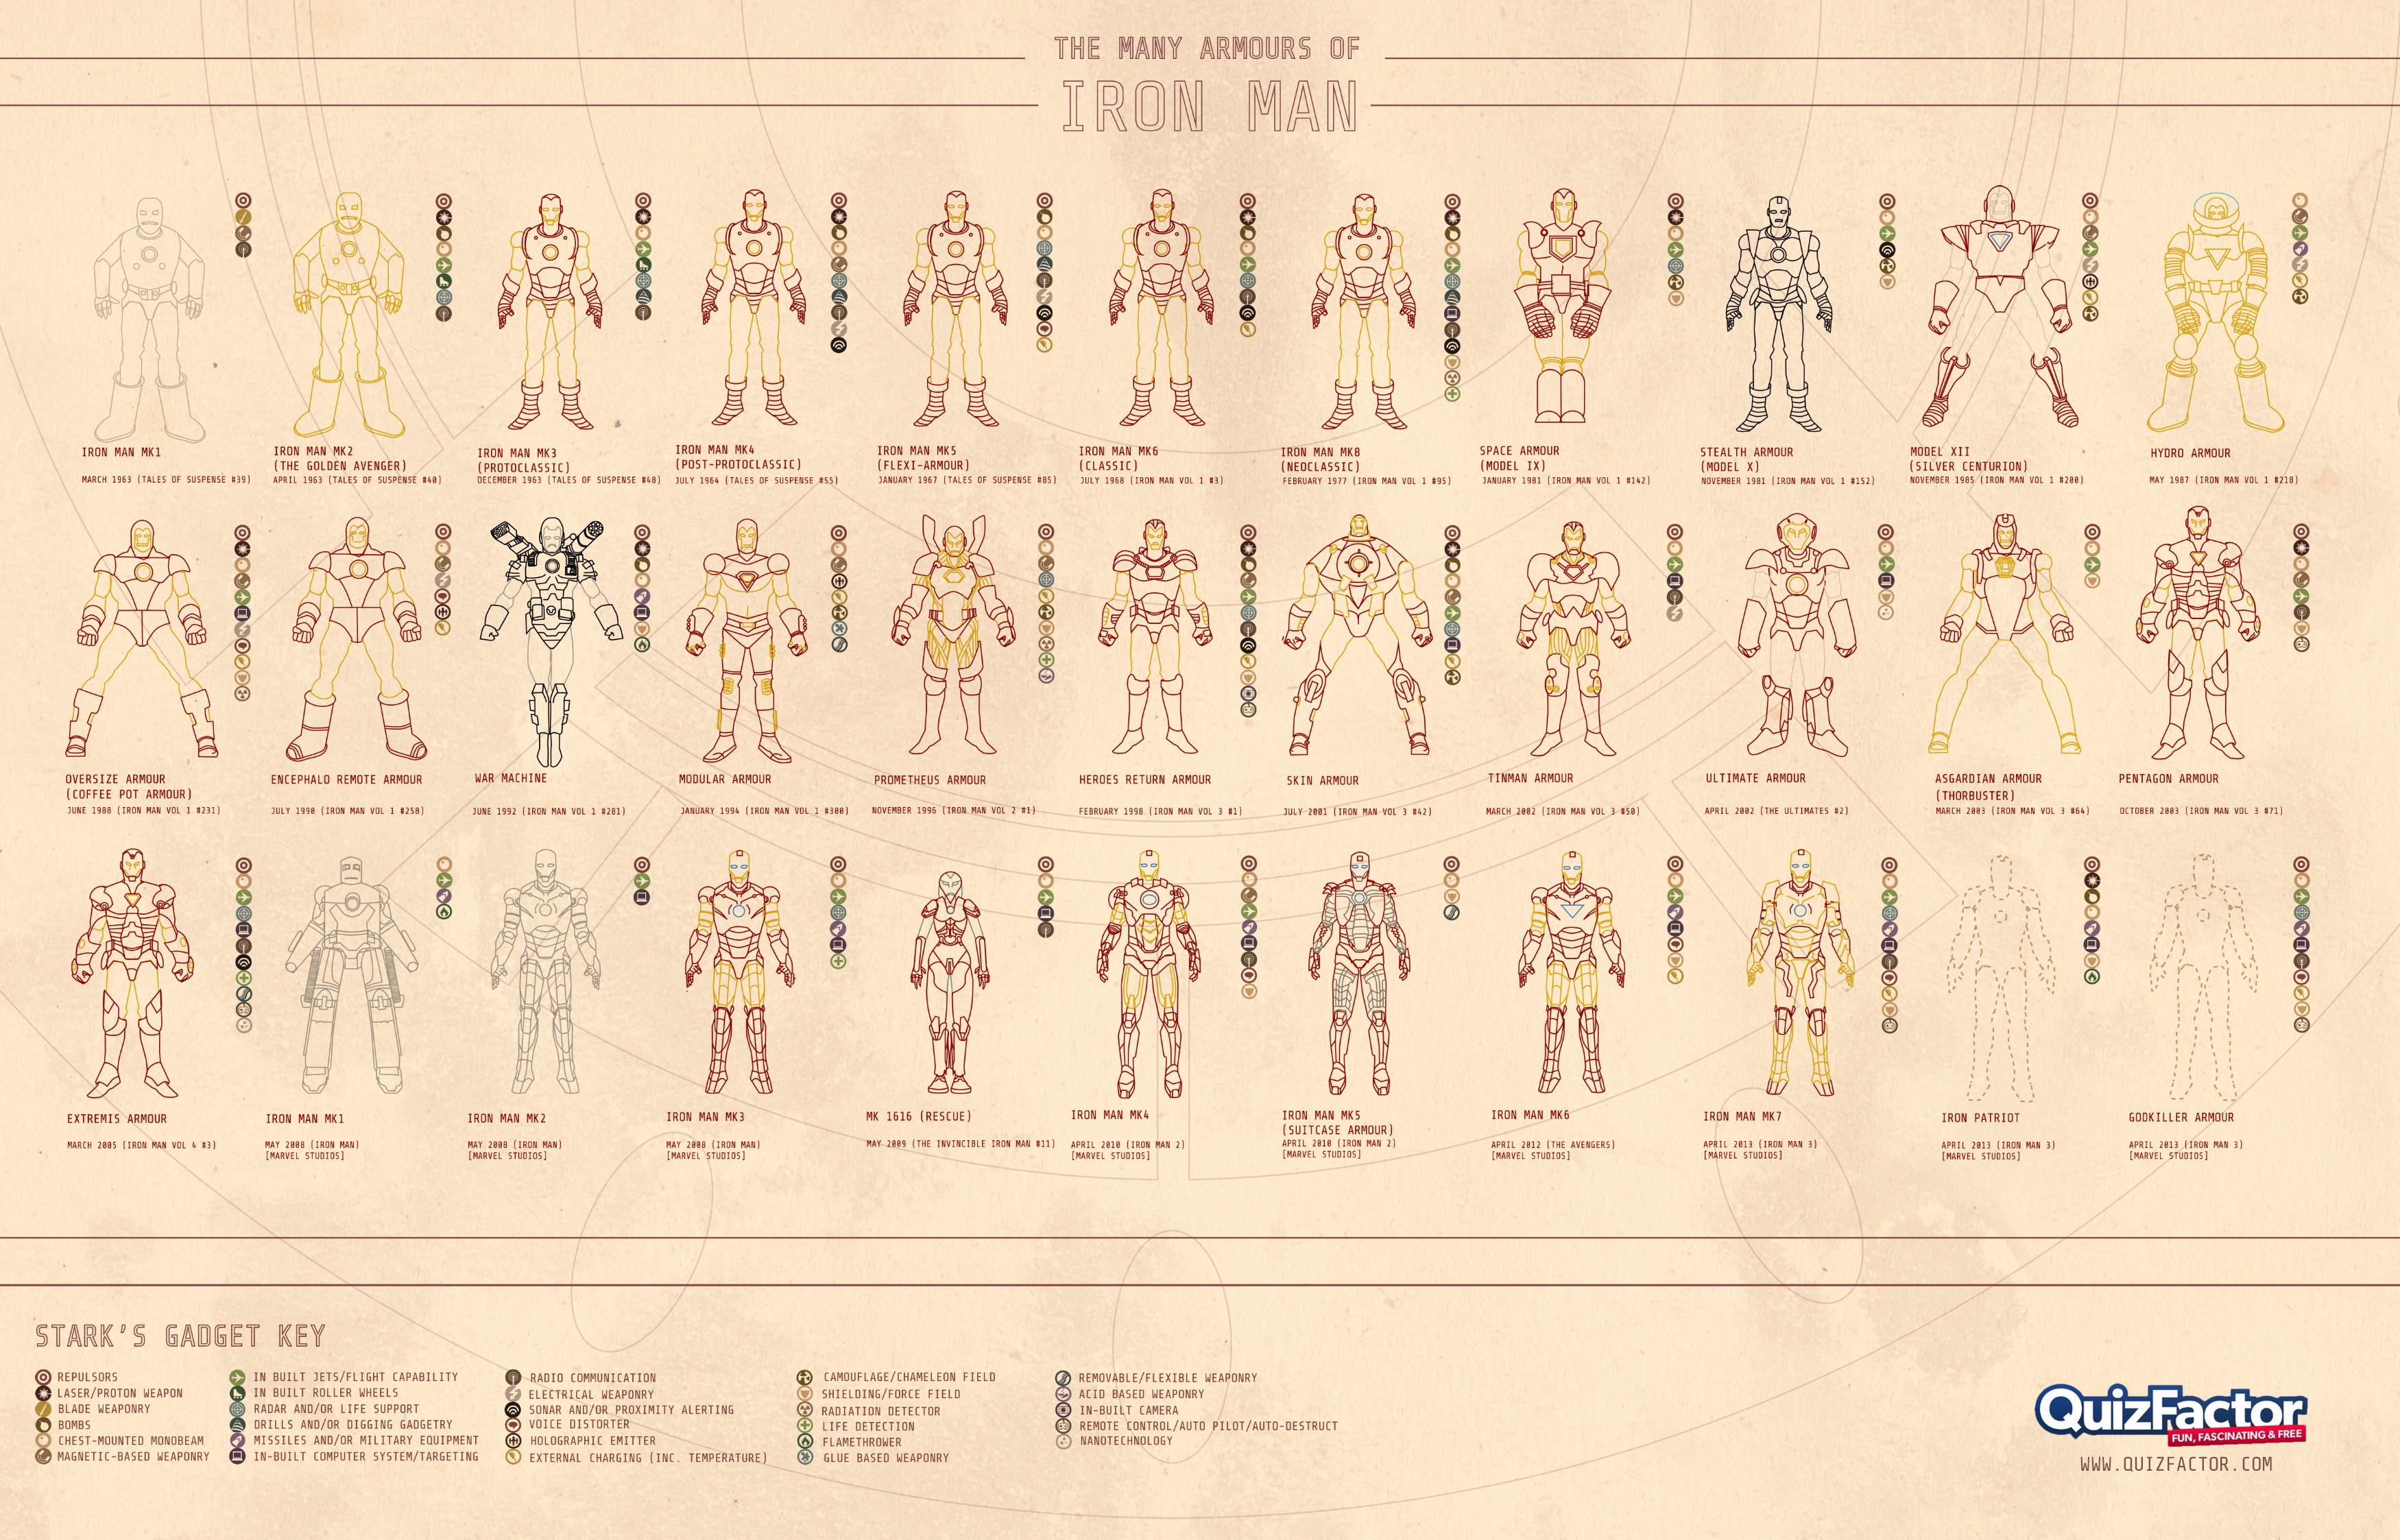 Iron Man 3 Armor Suits